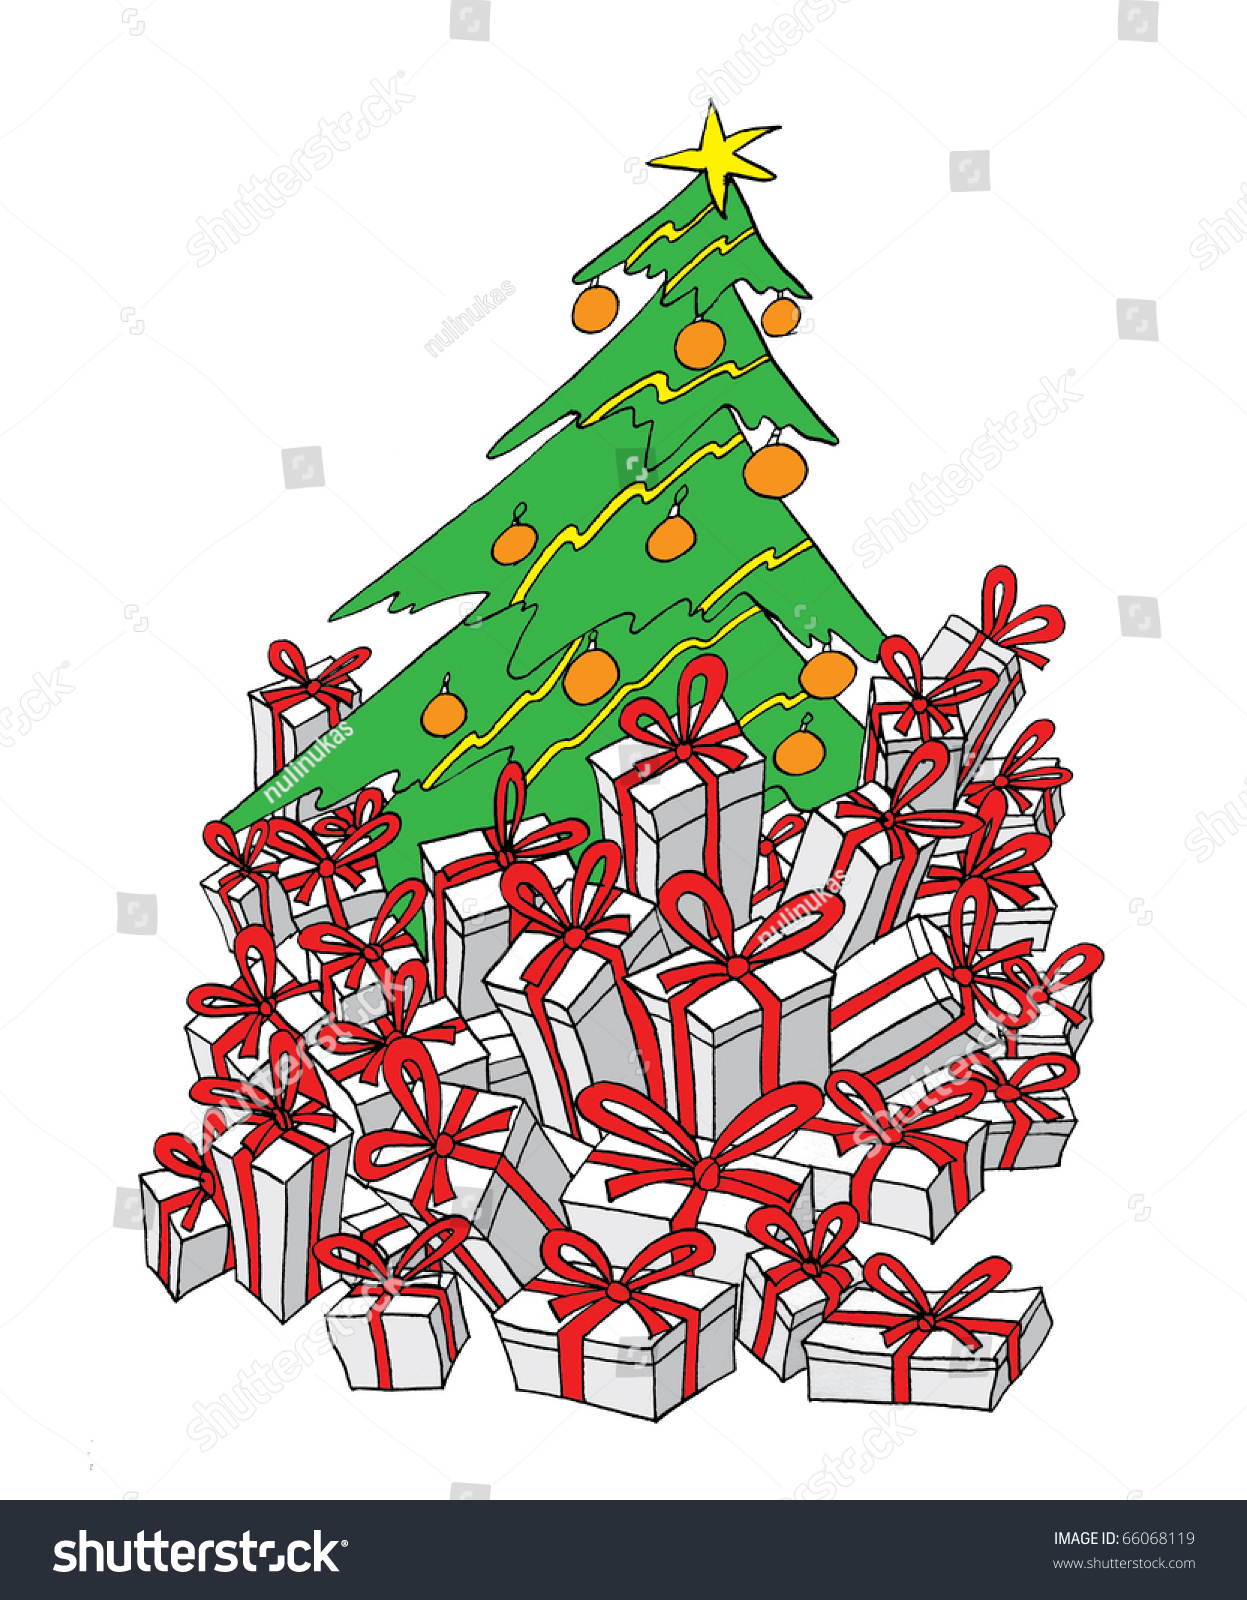 green christmas tree gifts stock illustration 66068119